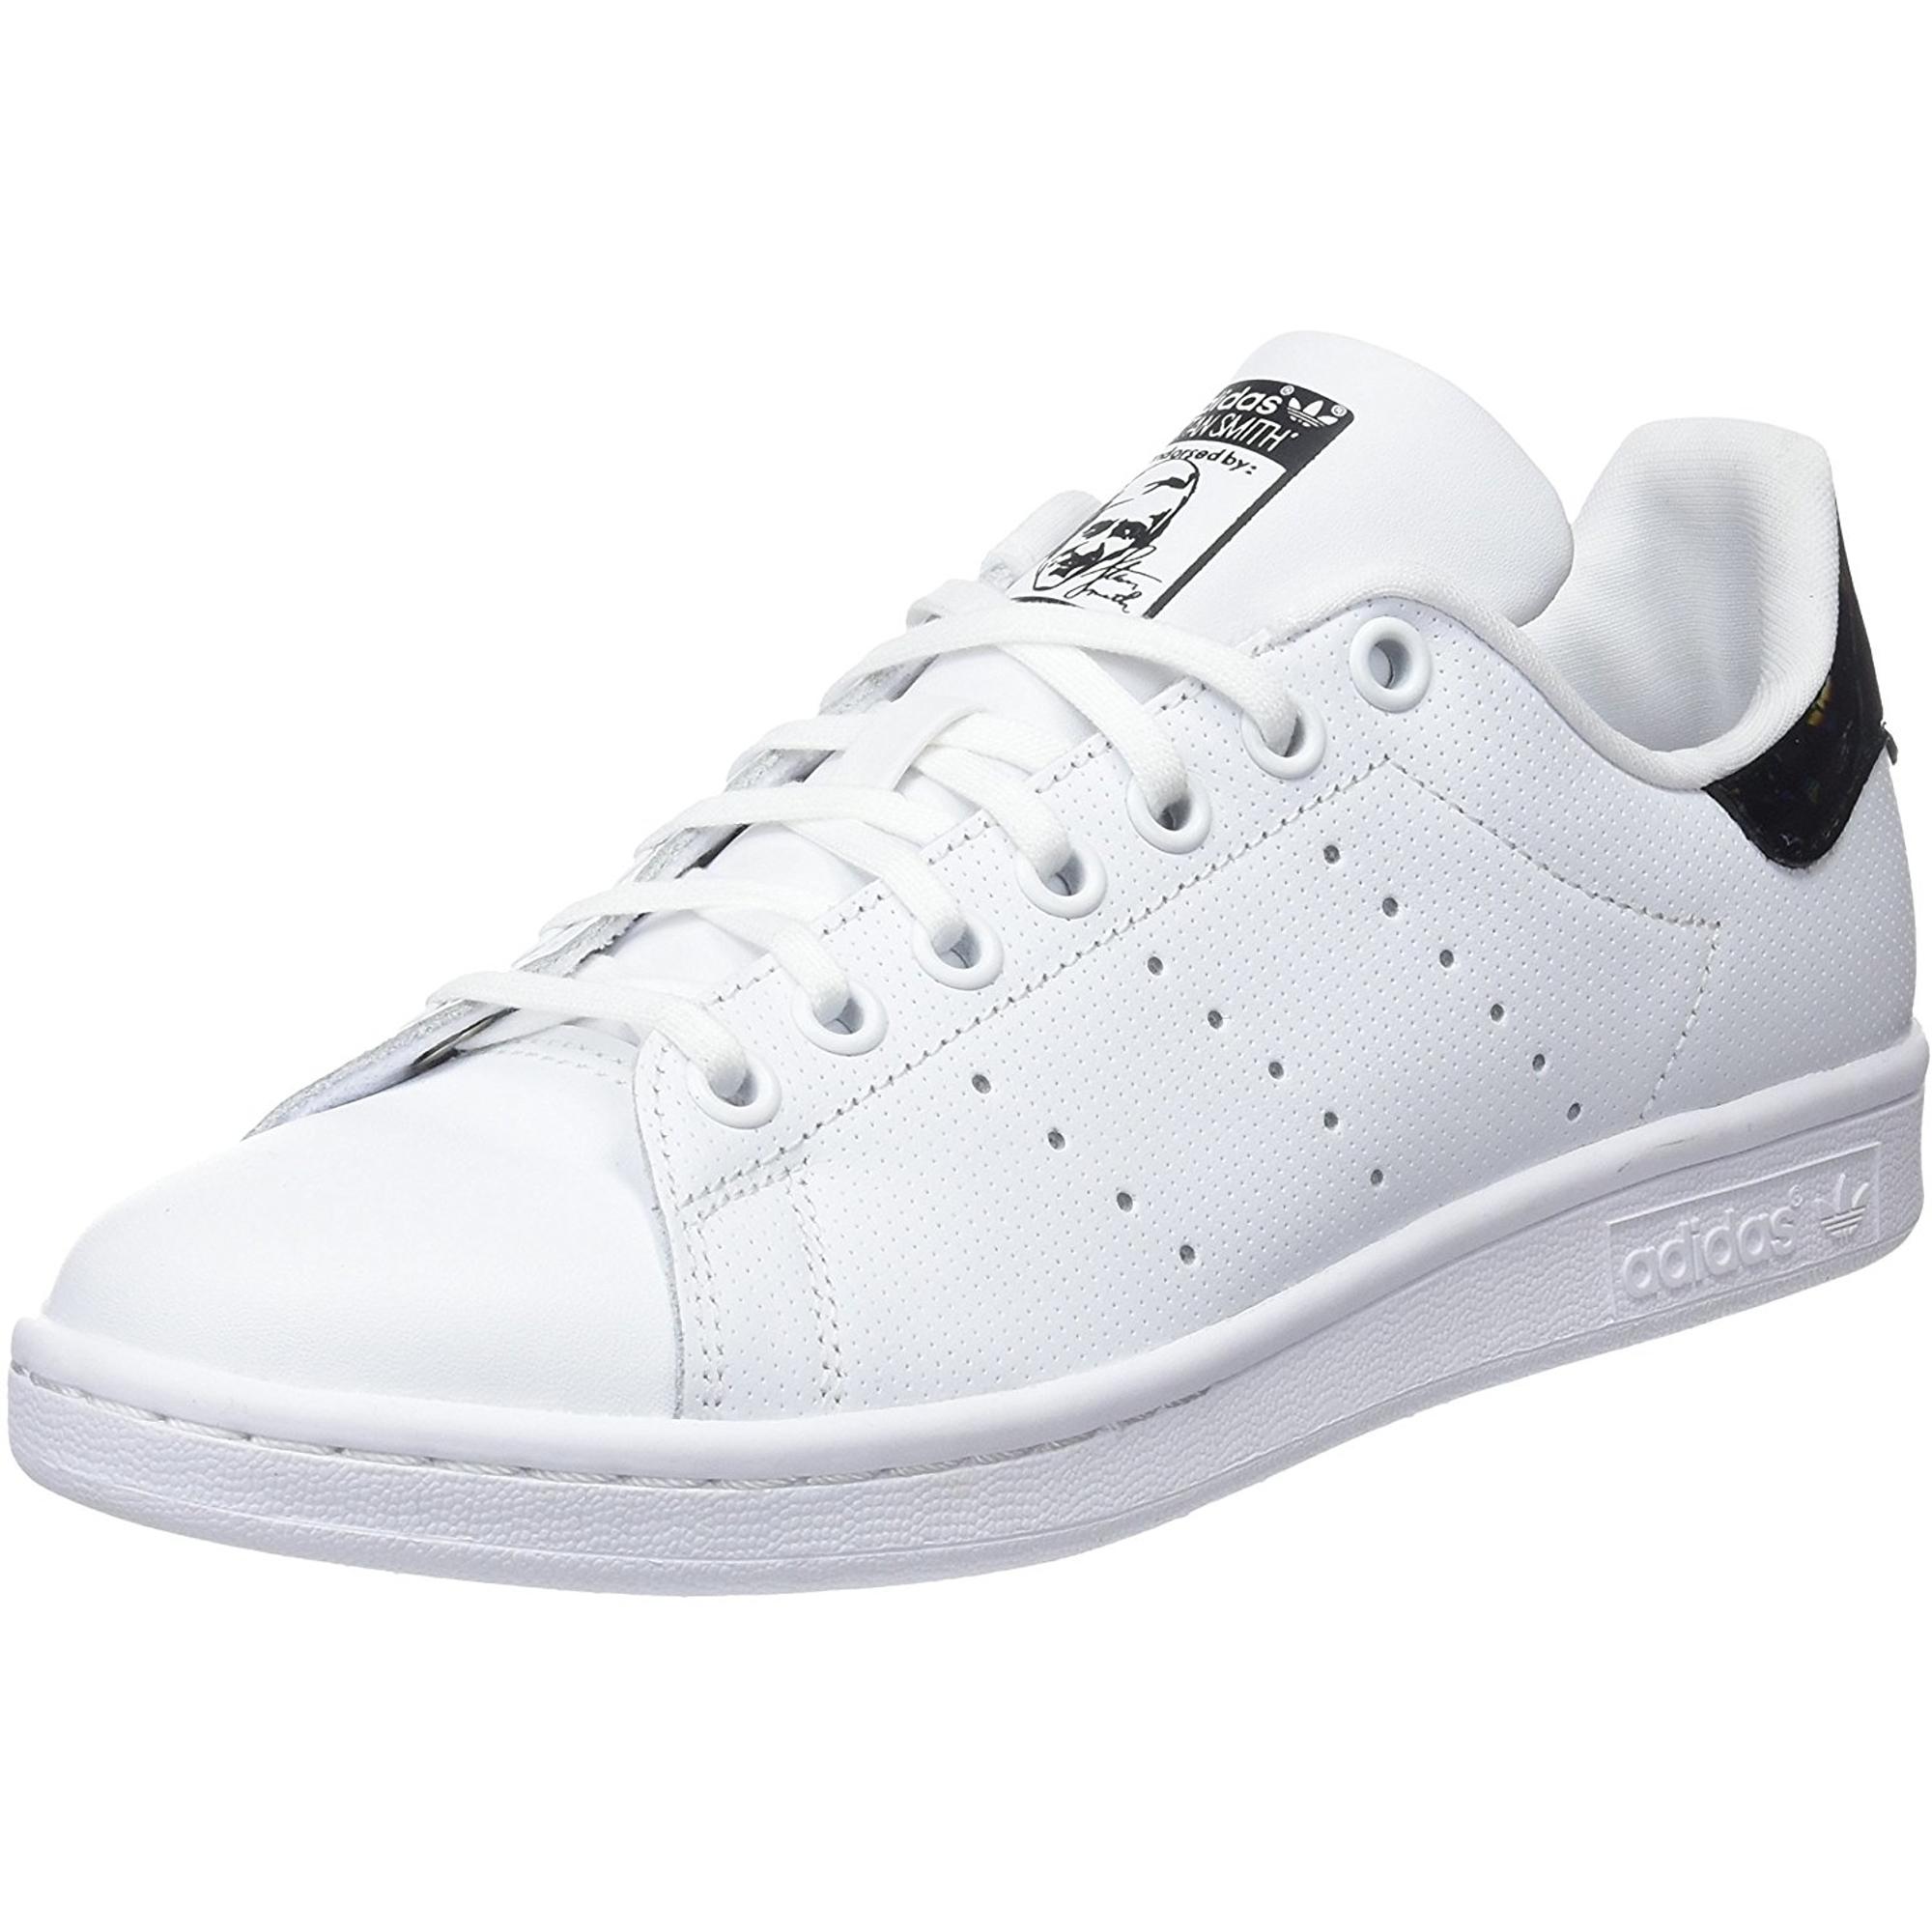 adidas Originals Stan Smith Schuh Sneaker, Gummi Cupsohle